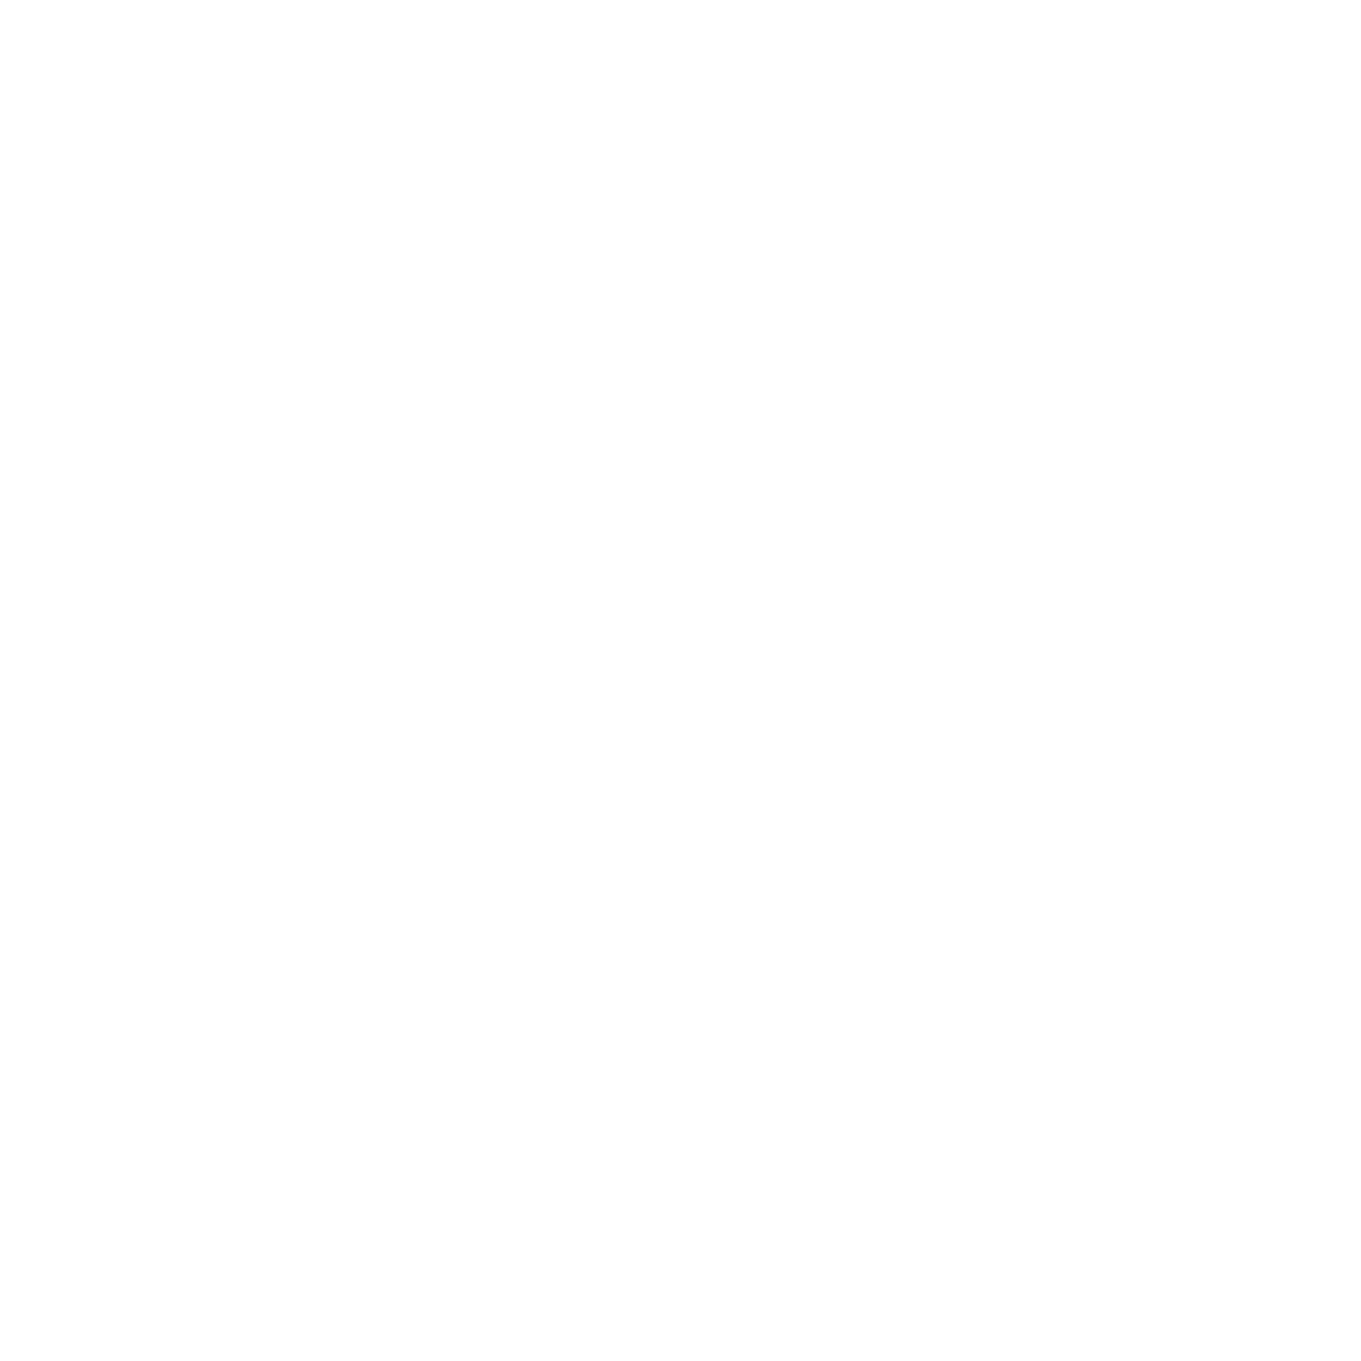 SHOORAH Society